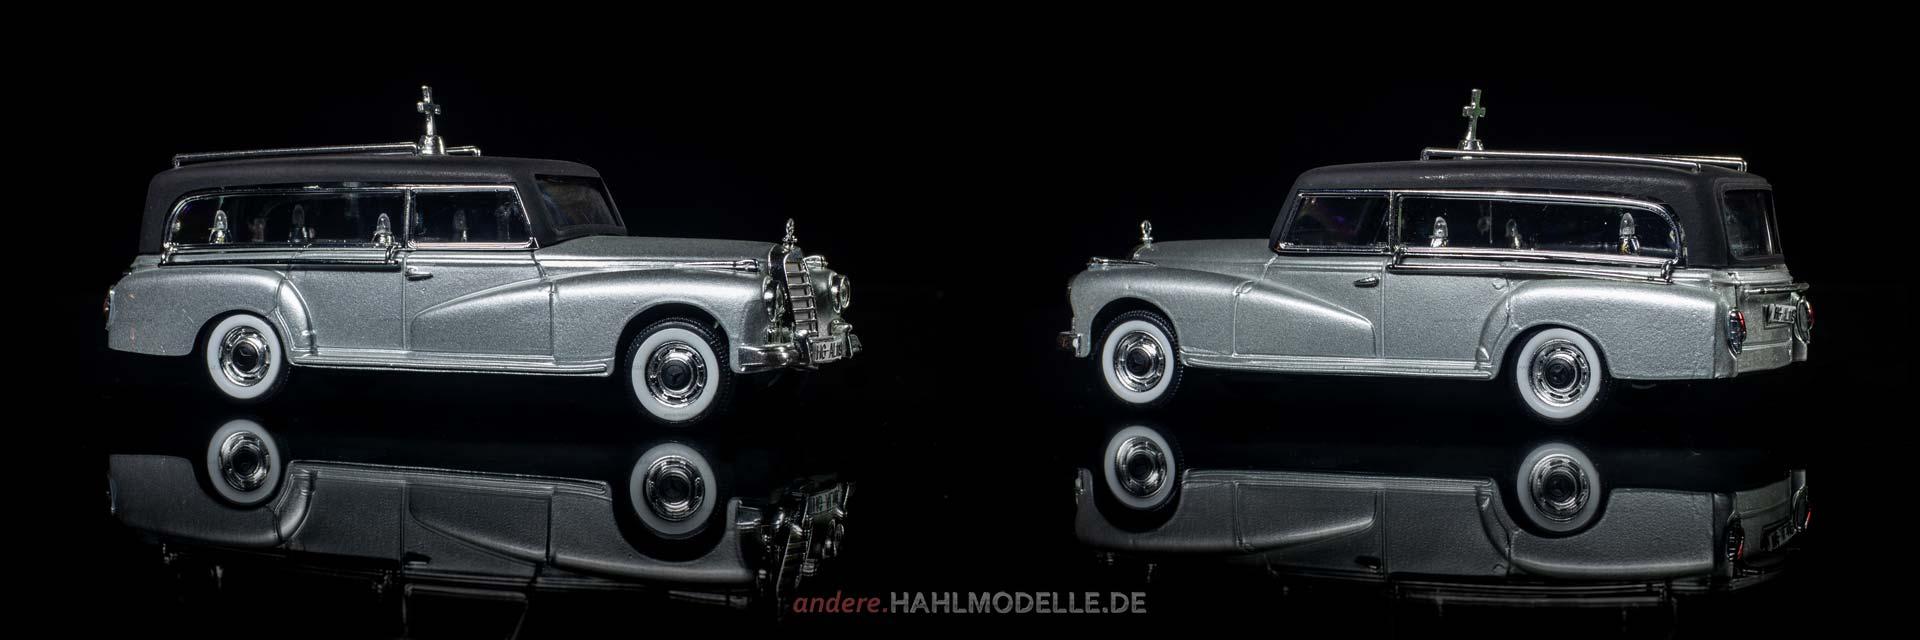 Mercedes-Benz 300d Bestatter (W 189) | Kombi | Rio | www.andere.hahlmodelle.de